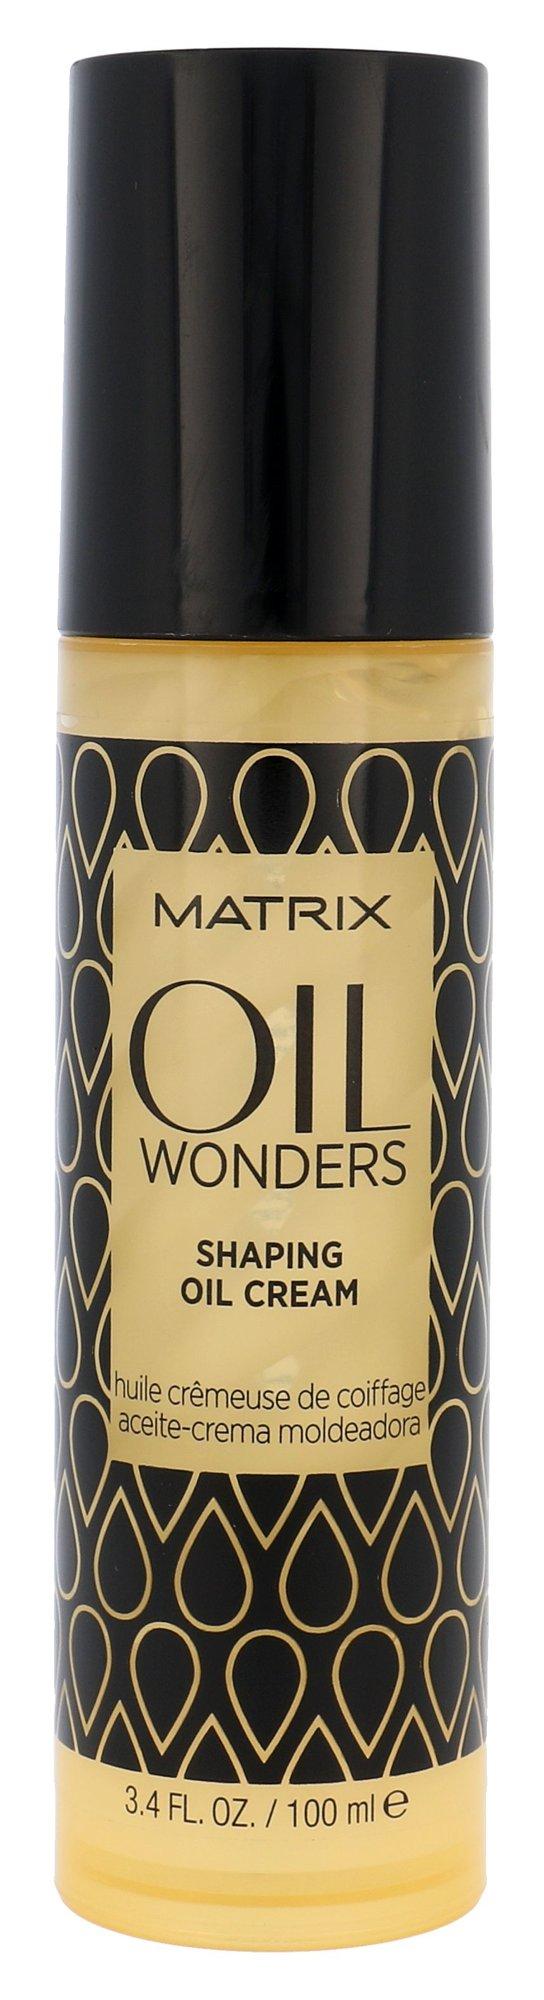 Matrix Oil Wonders Cosmetic 100ml